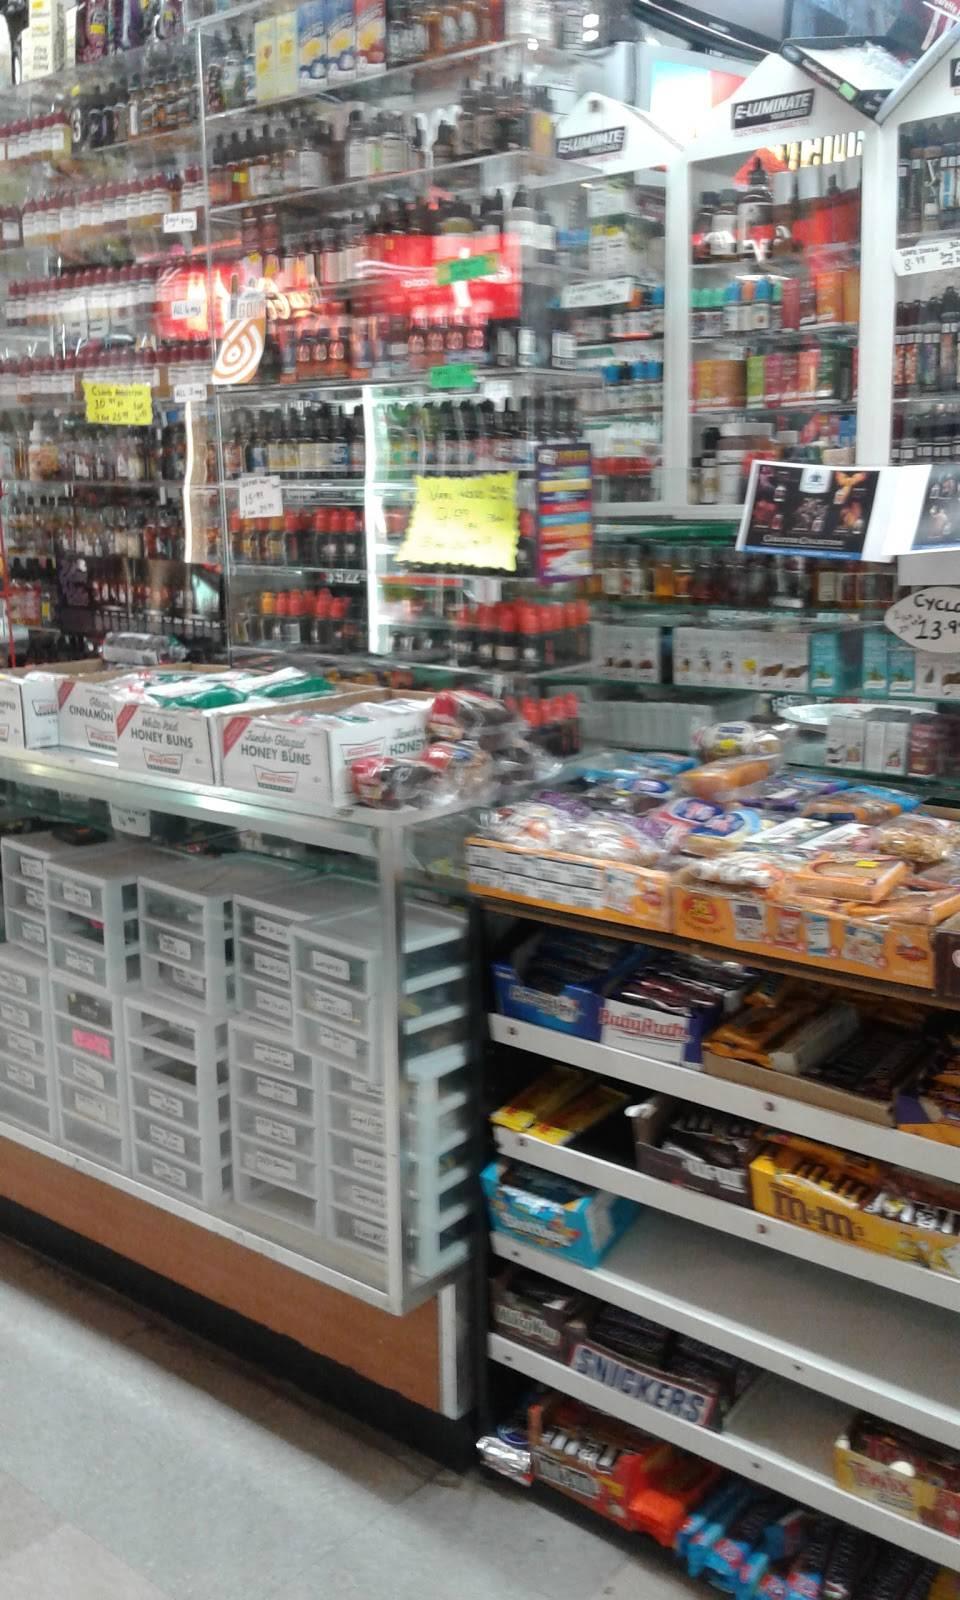 CCs Tobacco and Package   restaurant   8045 Stemley Bridge Rd, Talladega, AL 35160, USA   2562686161 OR +1 256-268-6161